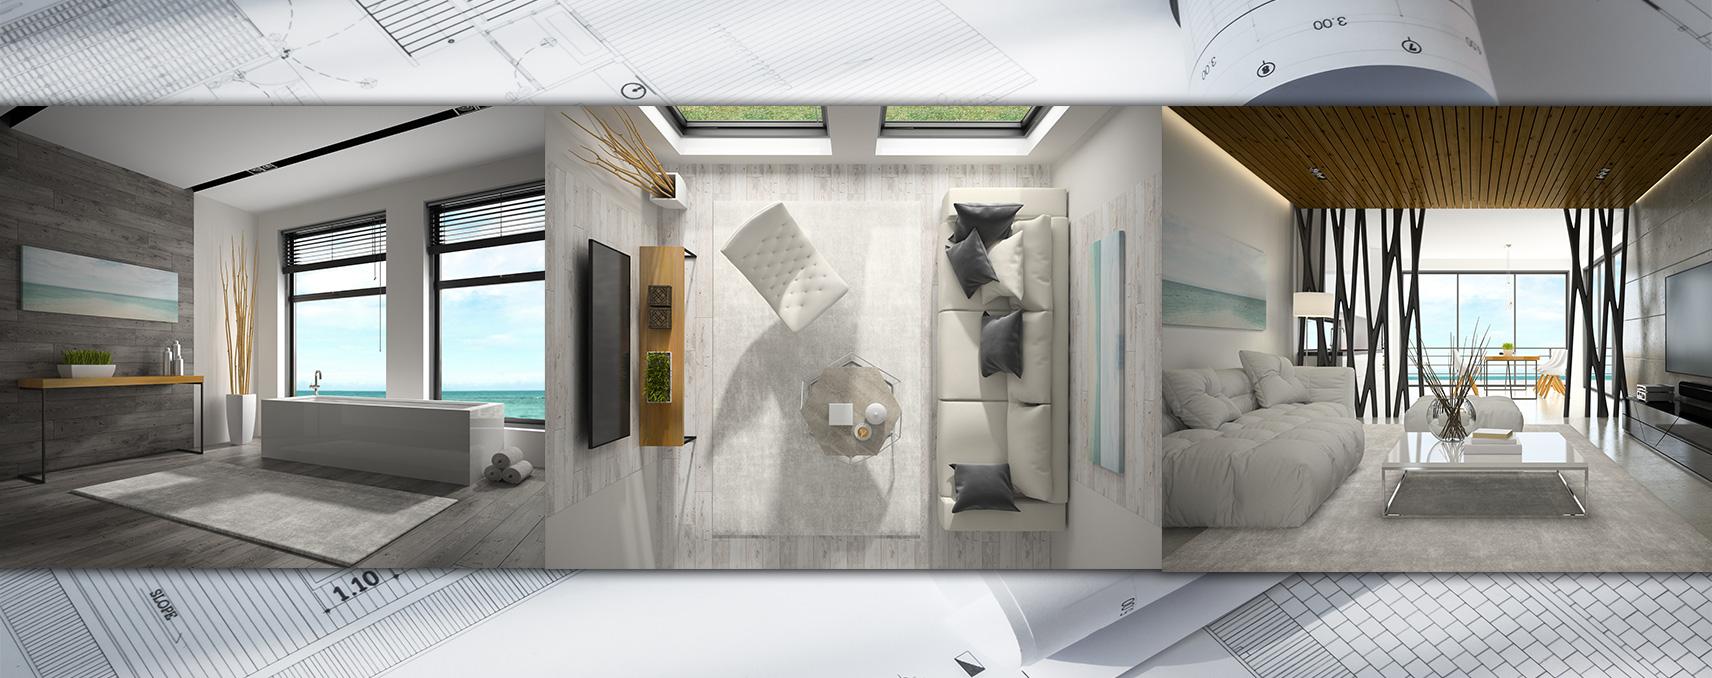 Interior Design Source Furniture ~ Ipaexport hospitality hotel restaurant supplier source